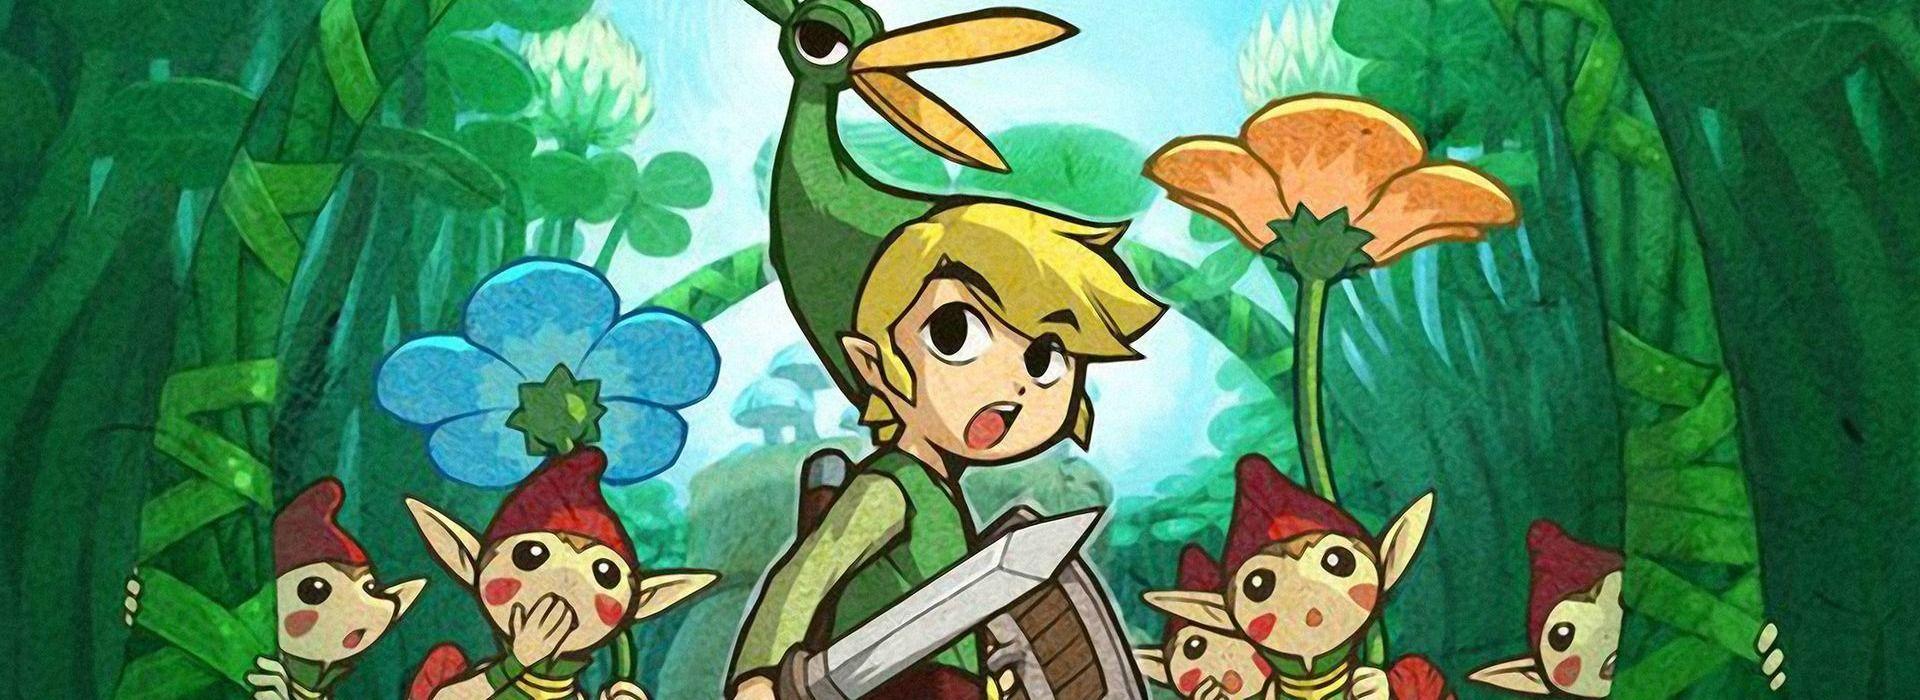 6263 - ¿Cuánto sabes de The Legend of Zelda: Minish Cap?